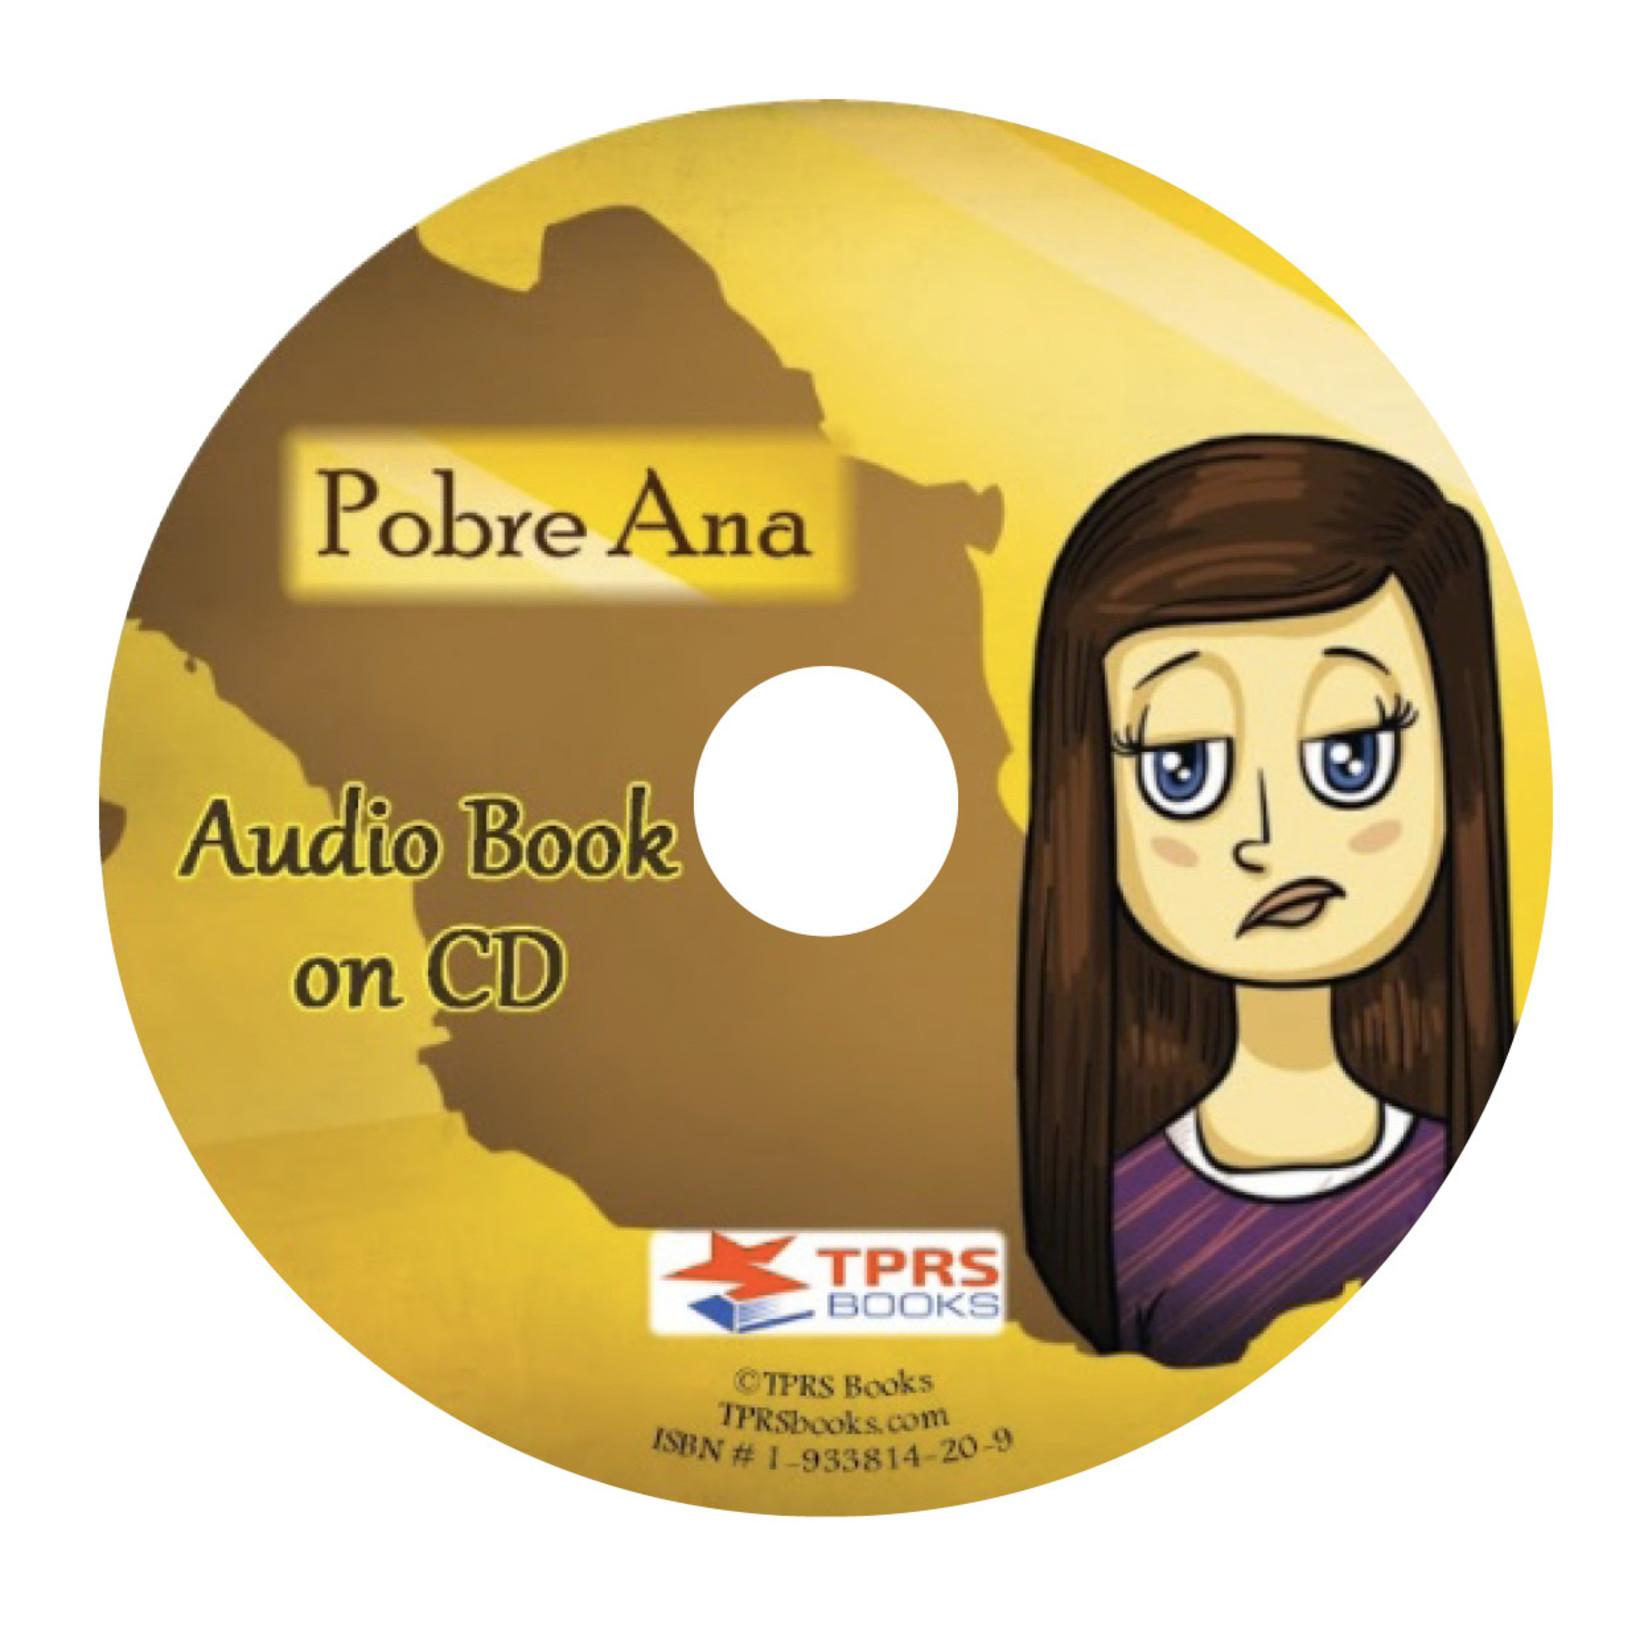 TPRS Books Pobre Ana - Luisterboek